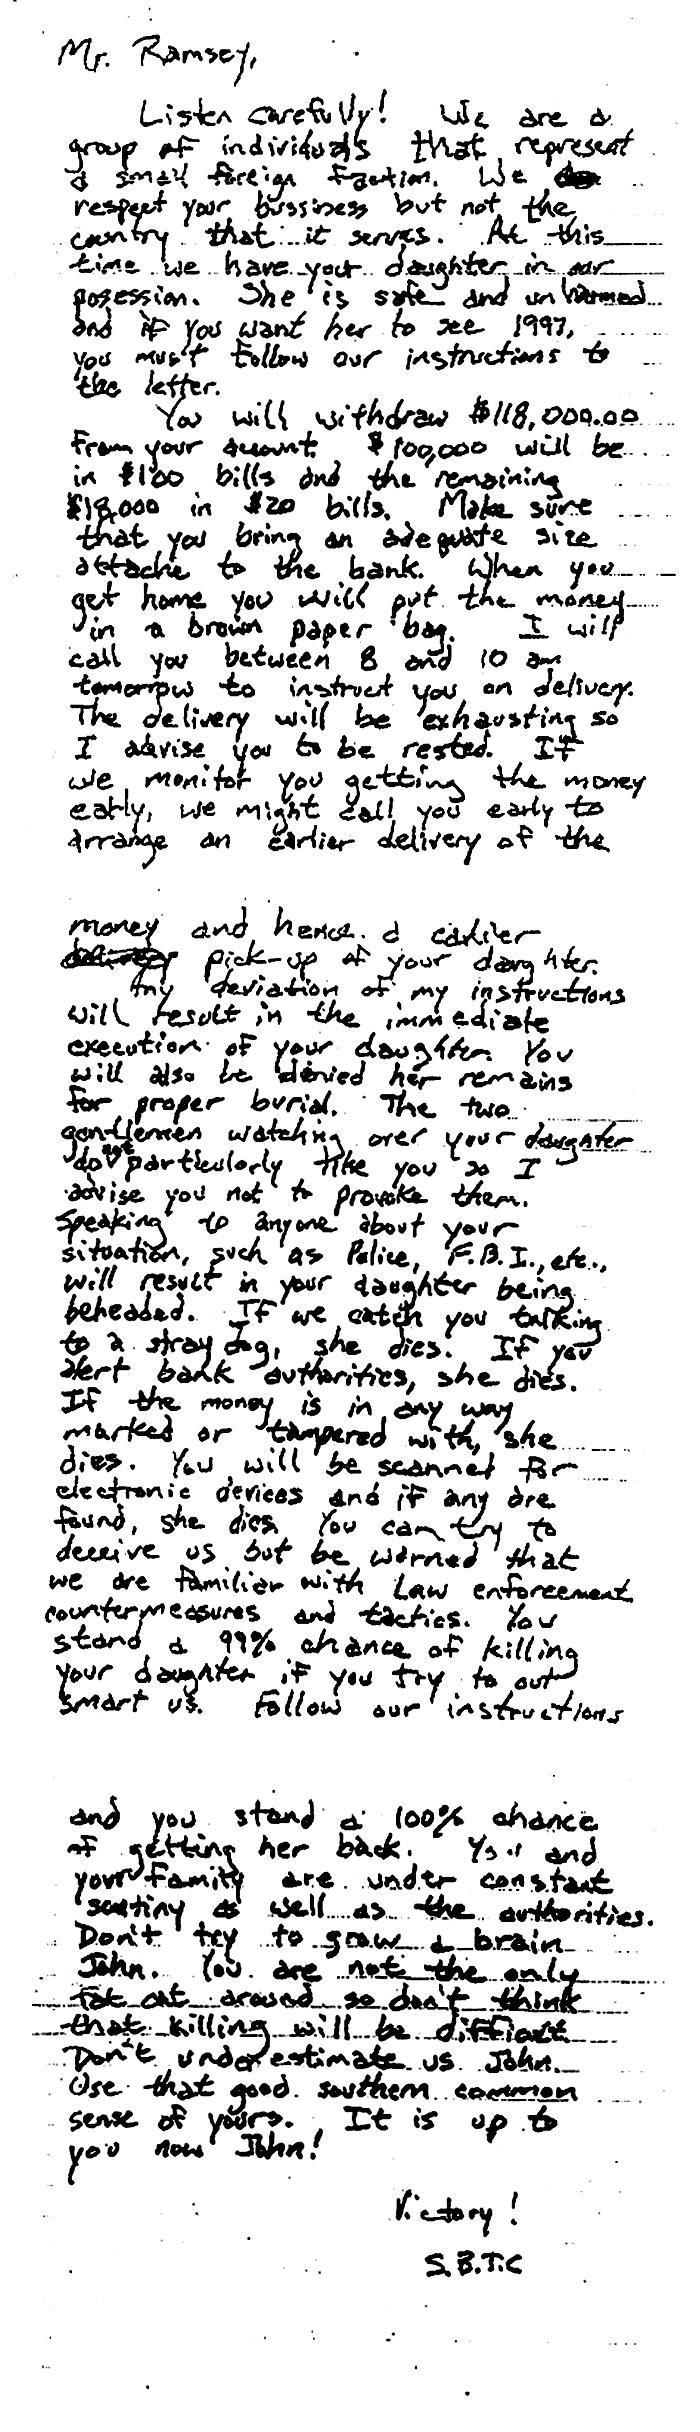 JonBenet Ramsey ransom note.jpg